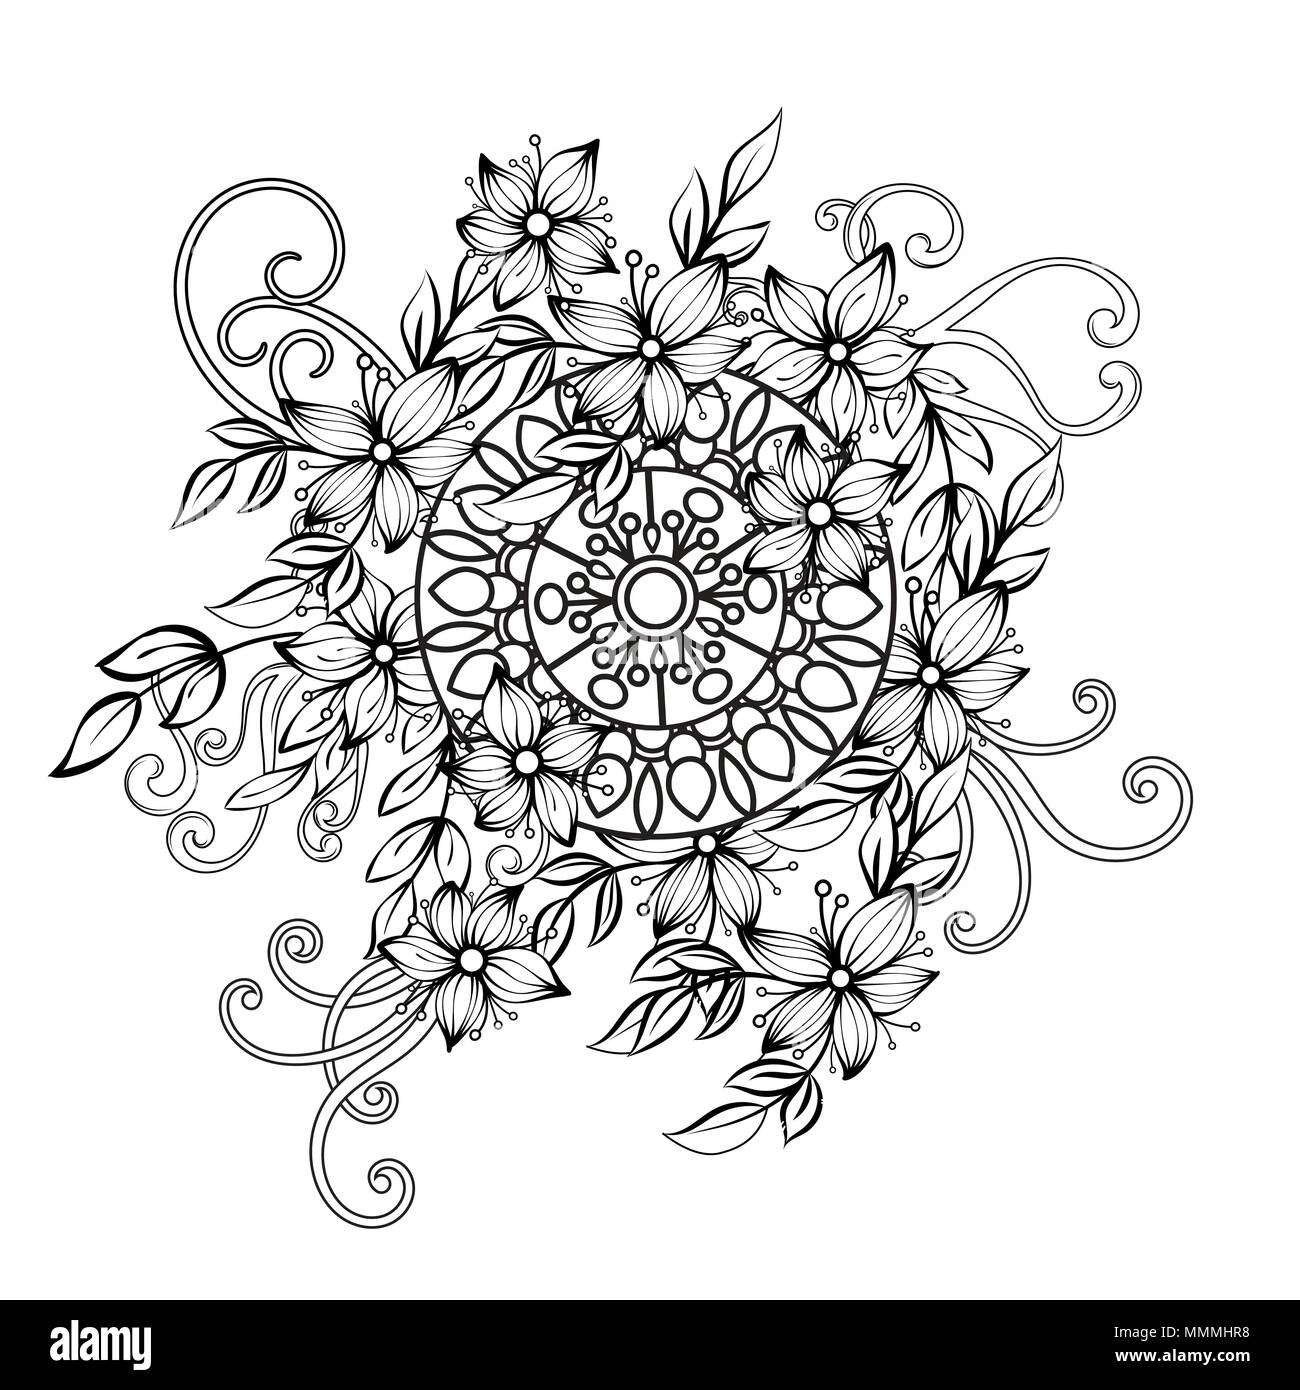 Lujoso Página Ovalada Para Colorear Ornamento - Dibujos Para ...